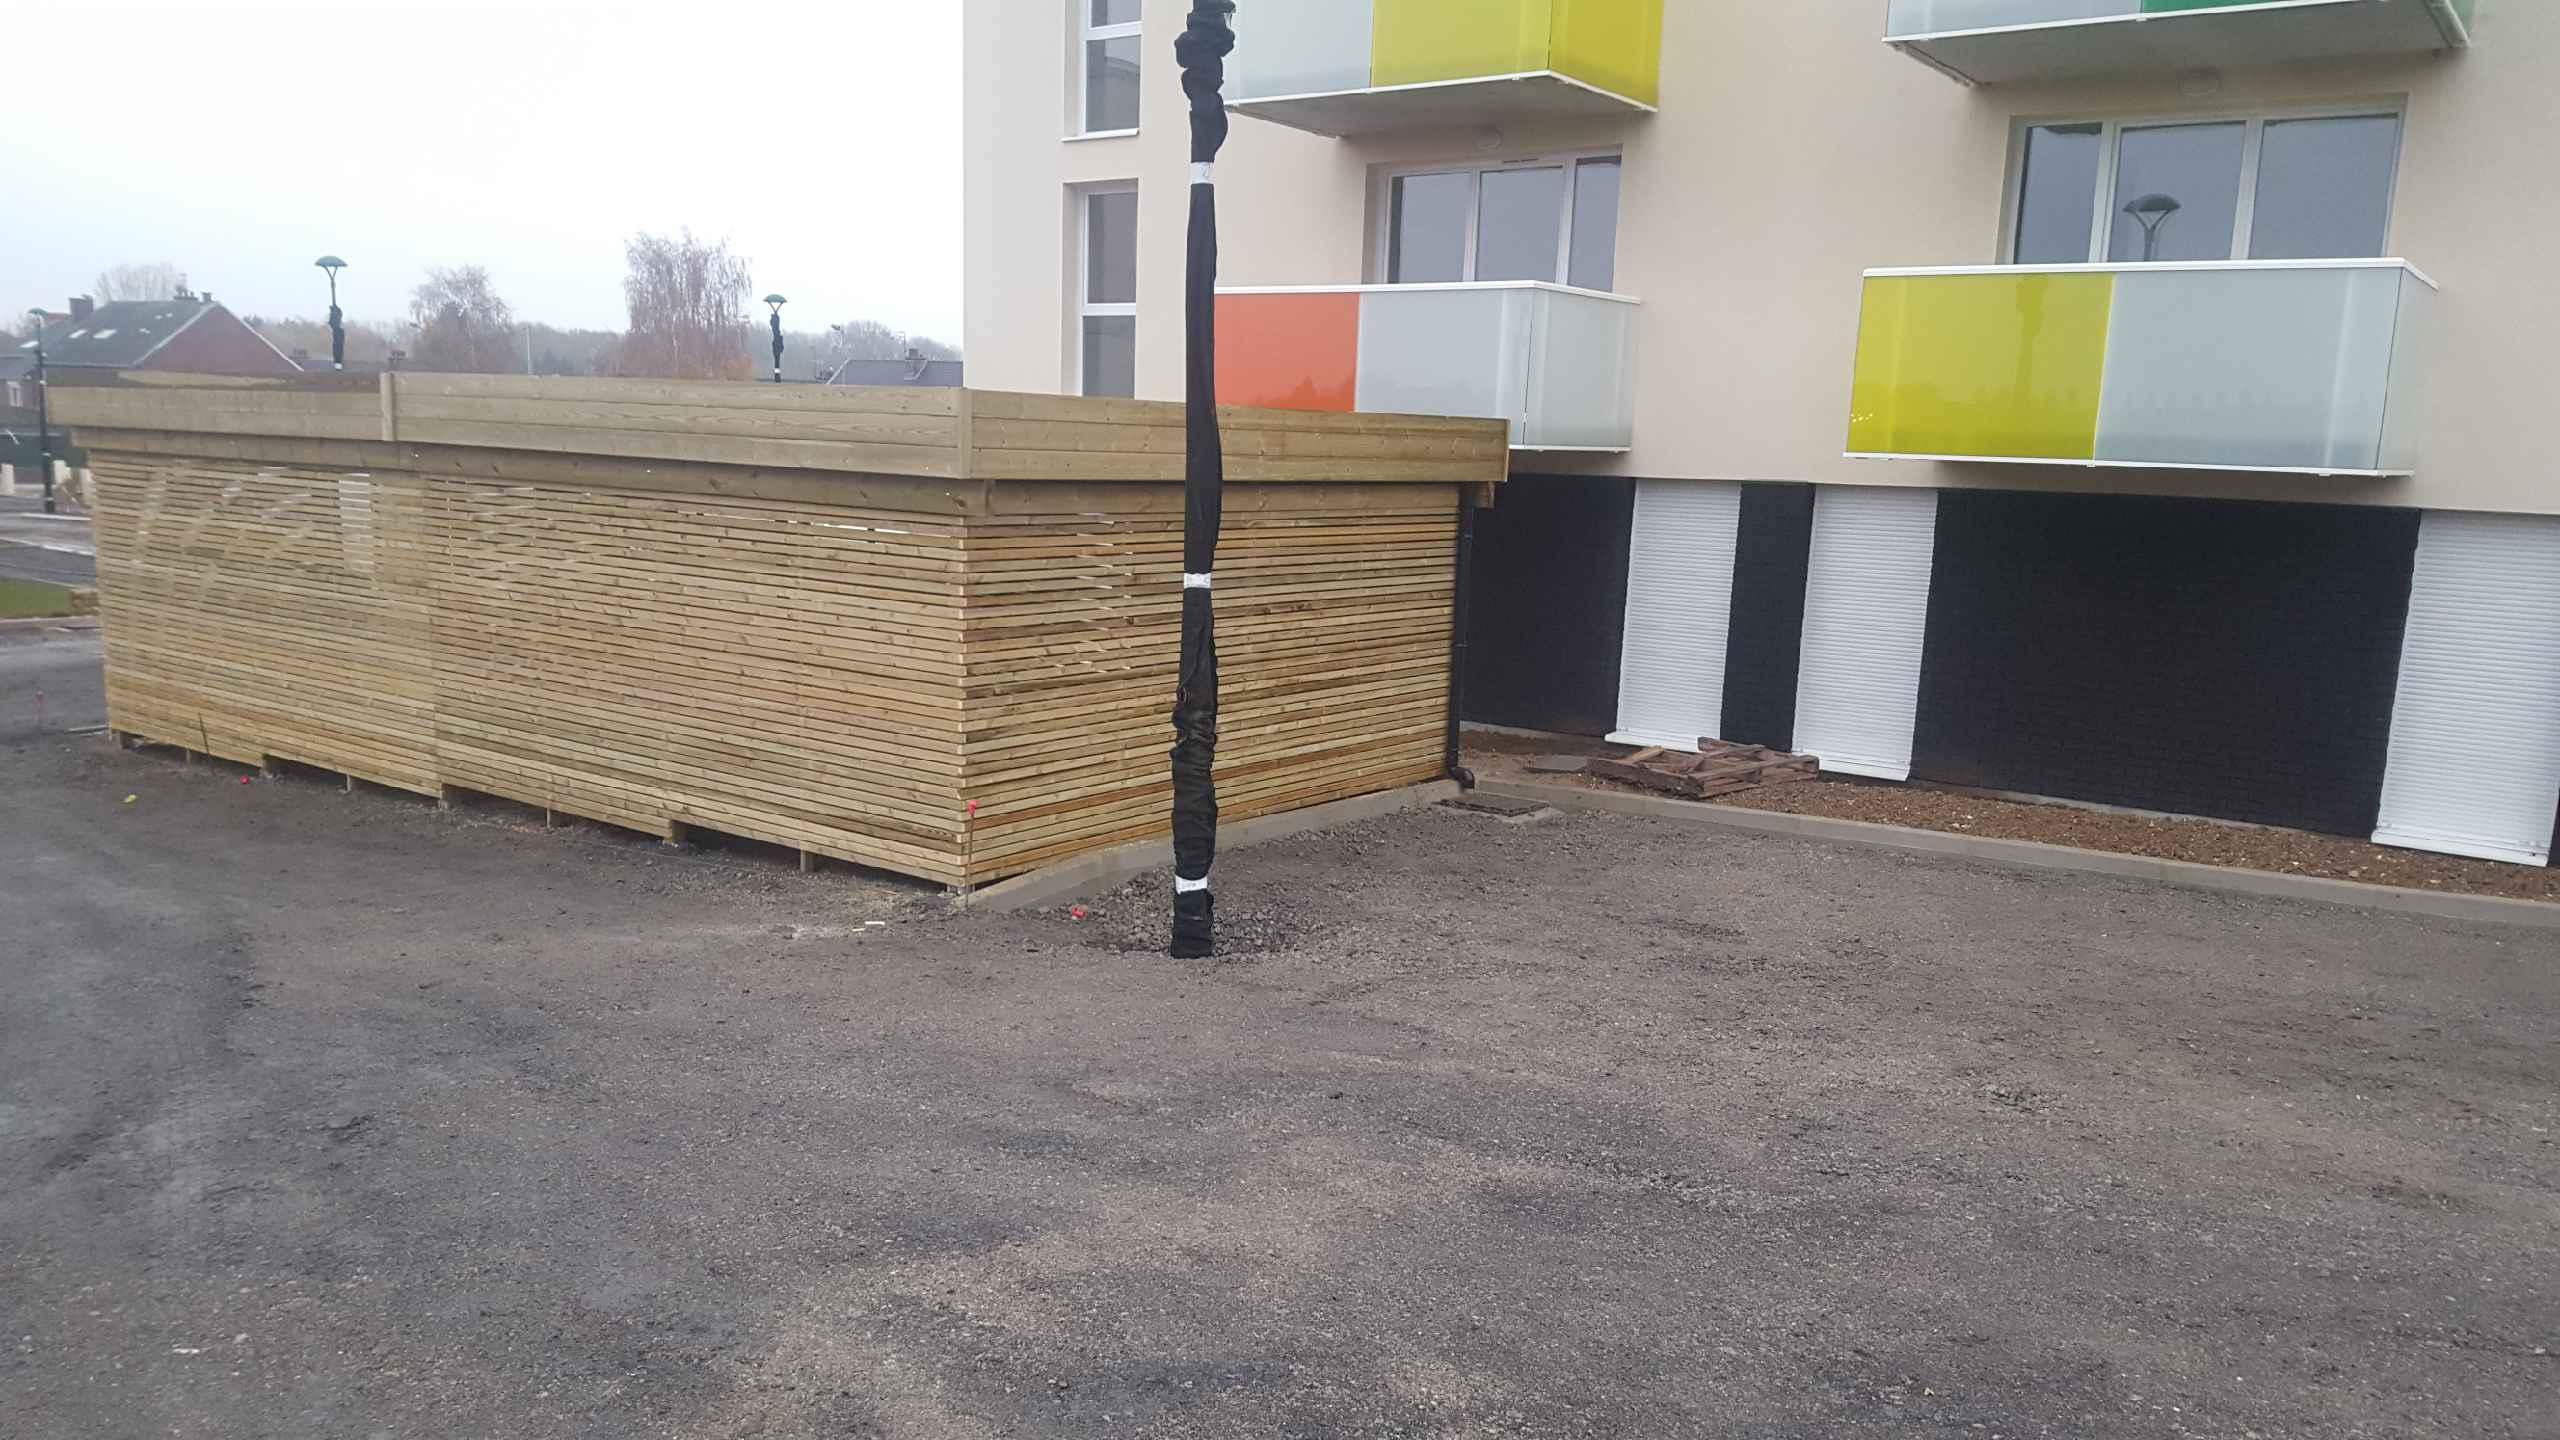 Construire Un Abri A Velo garage en bois sur-mesure| th-leman